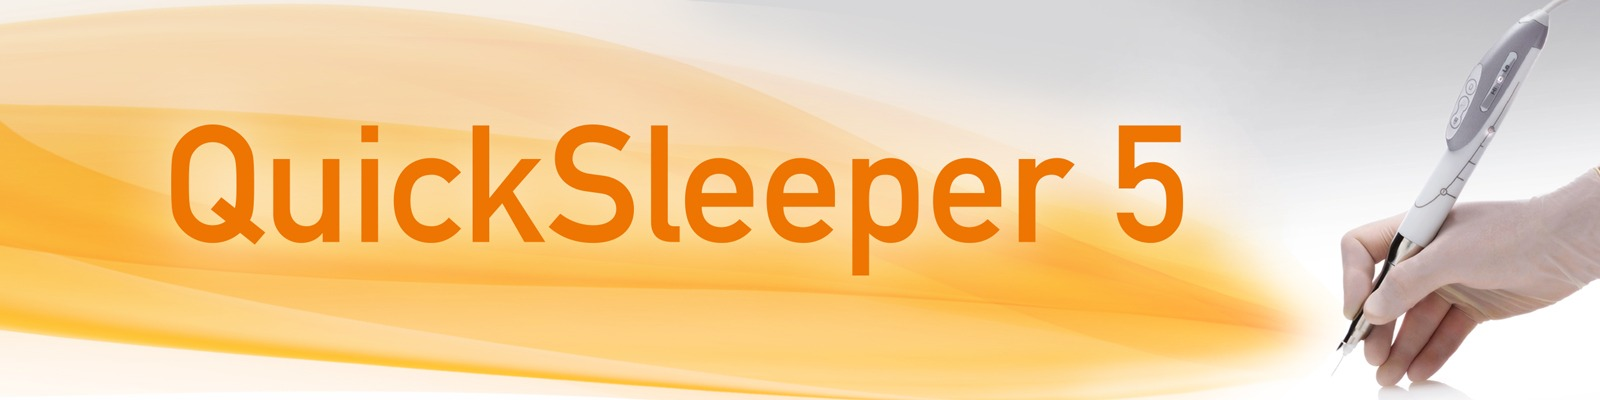 QuickSleeper S5 (Anästhesie)